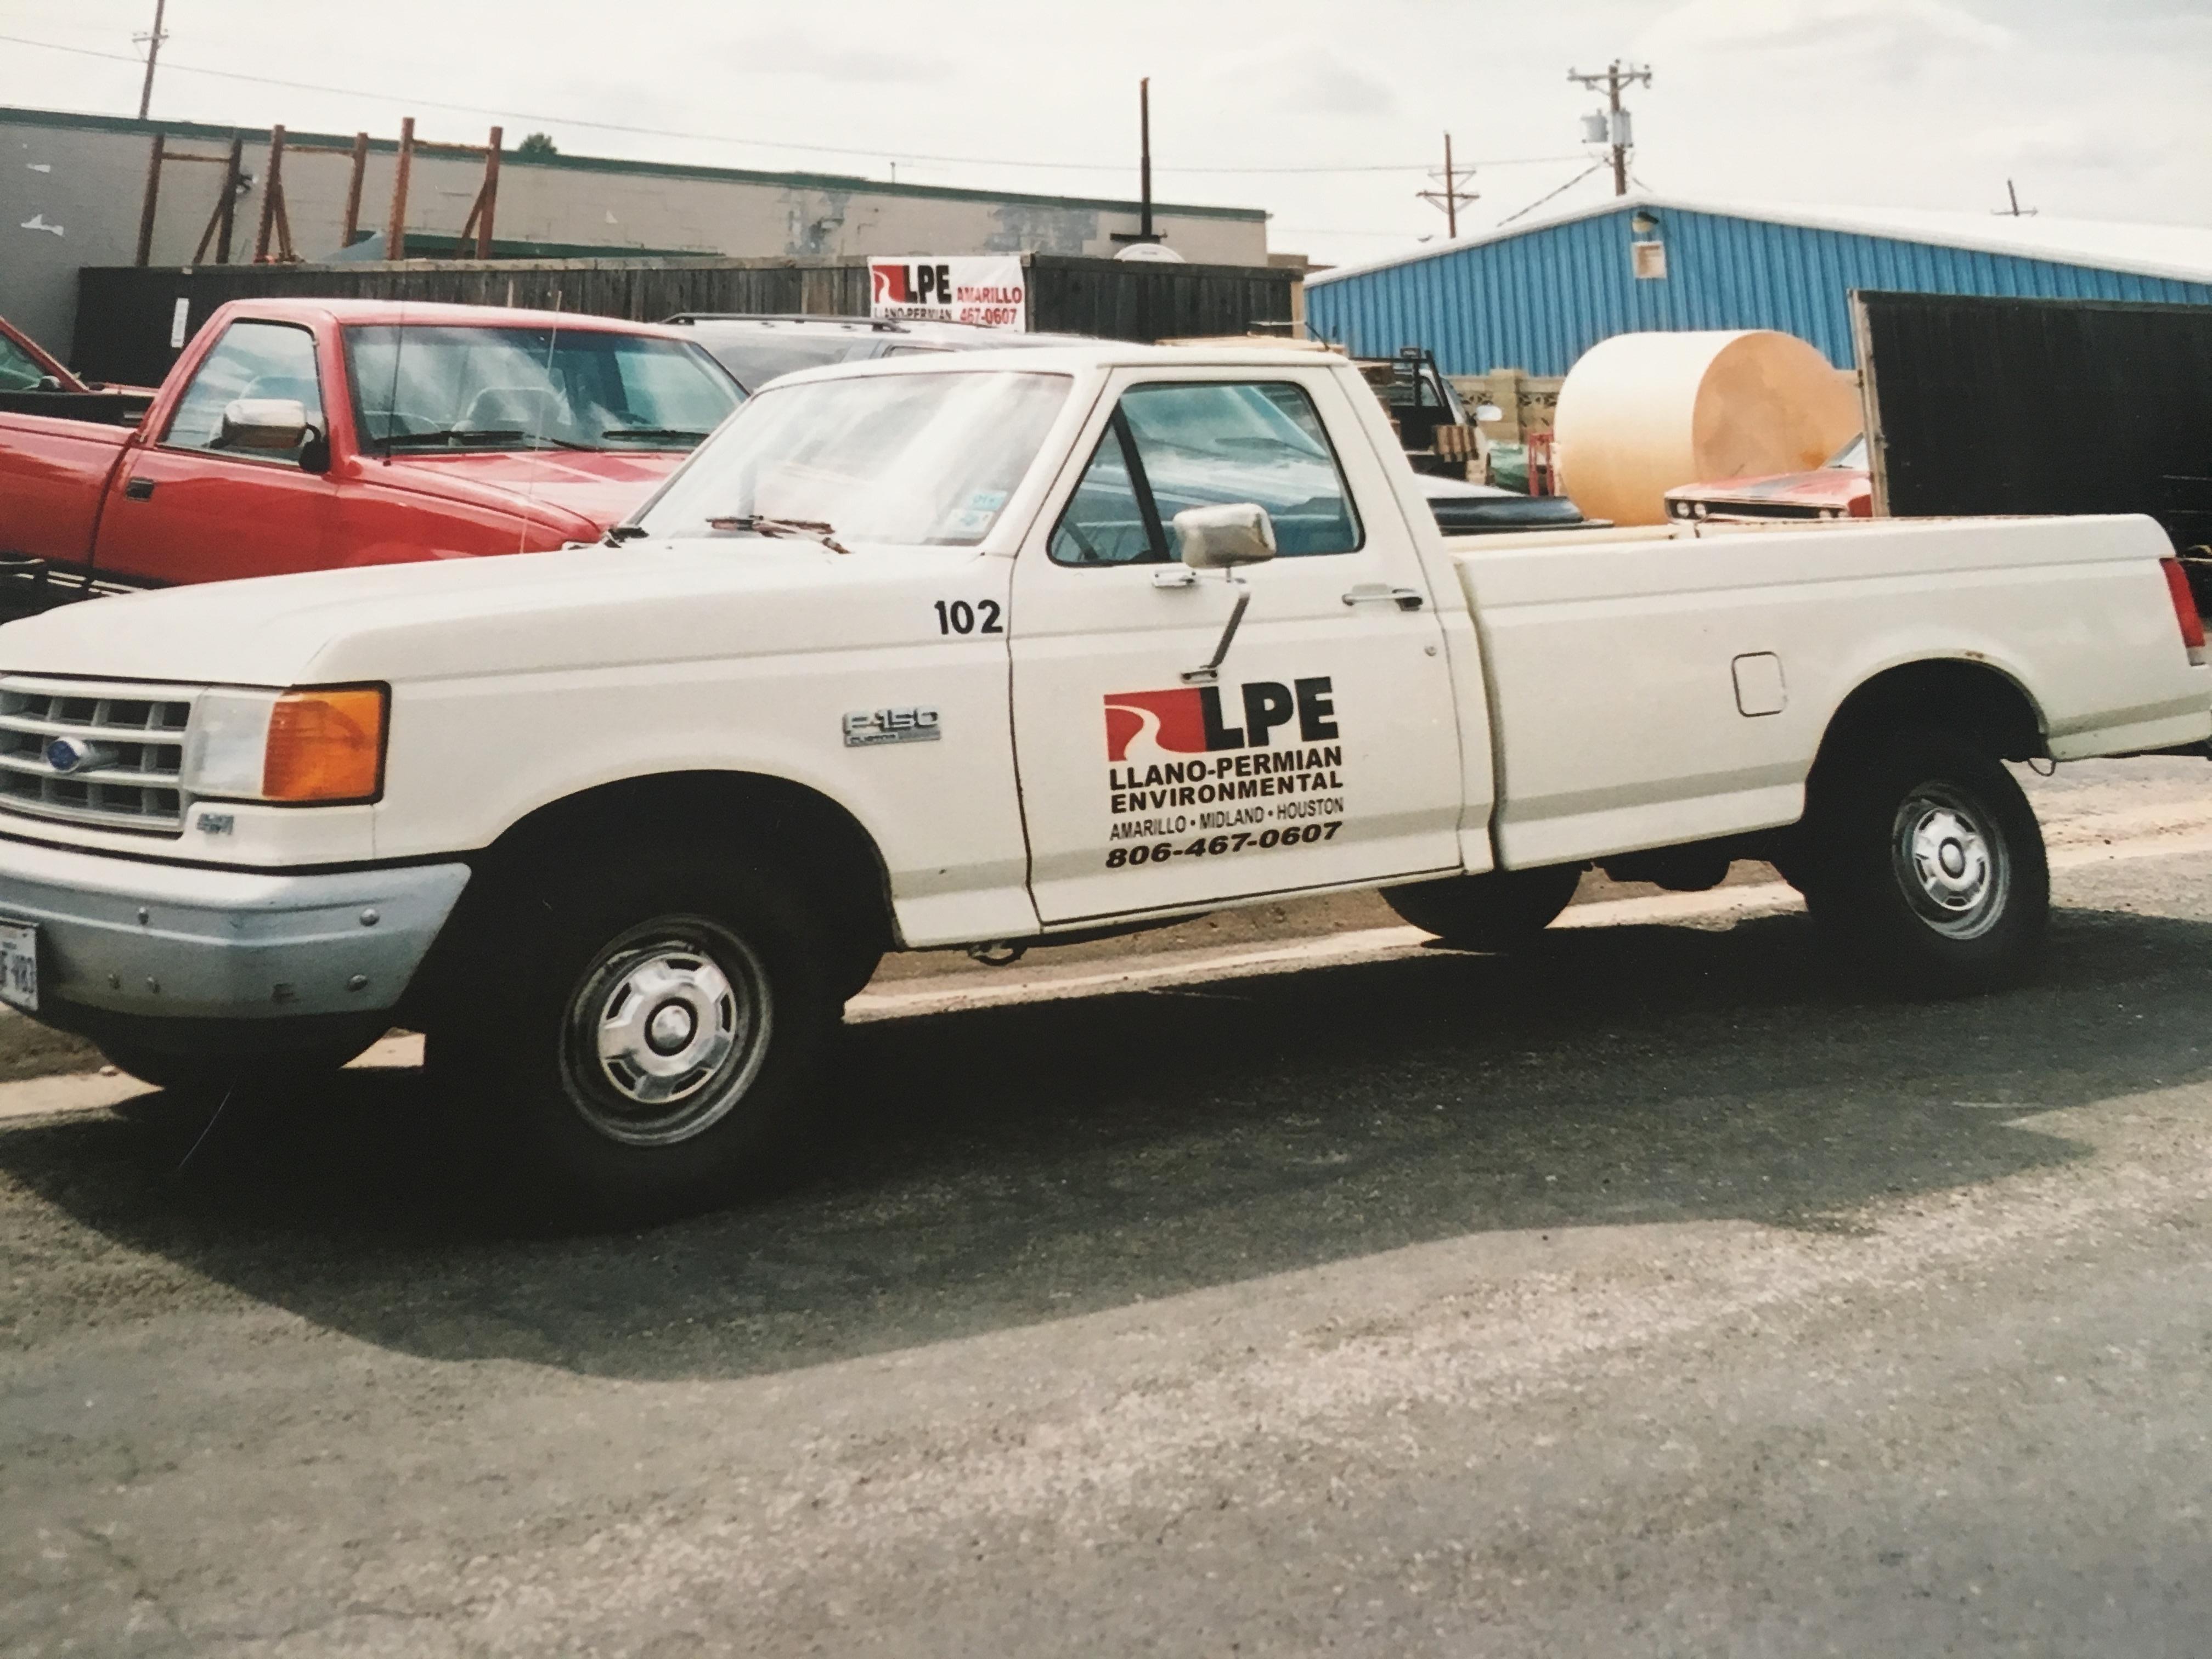 Talon/LPE Truck with Logo